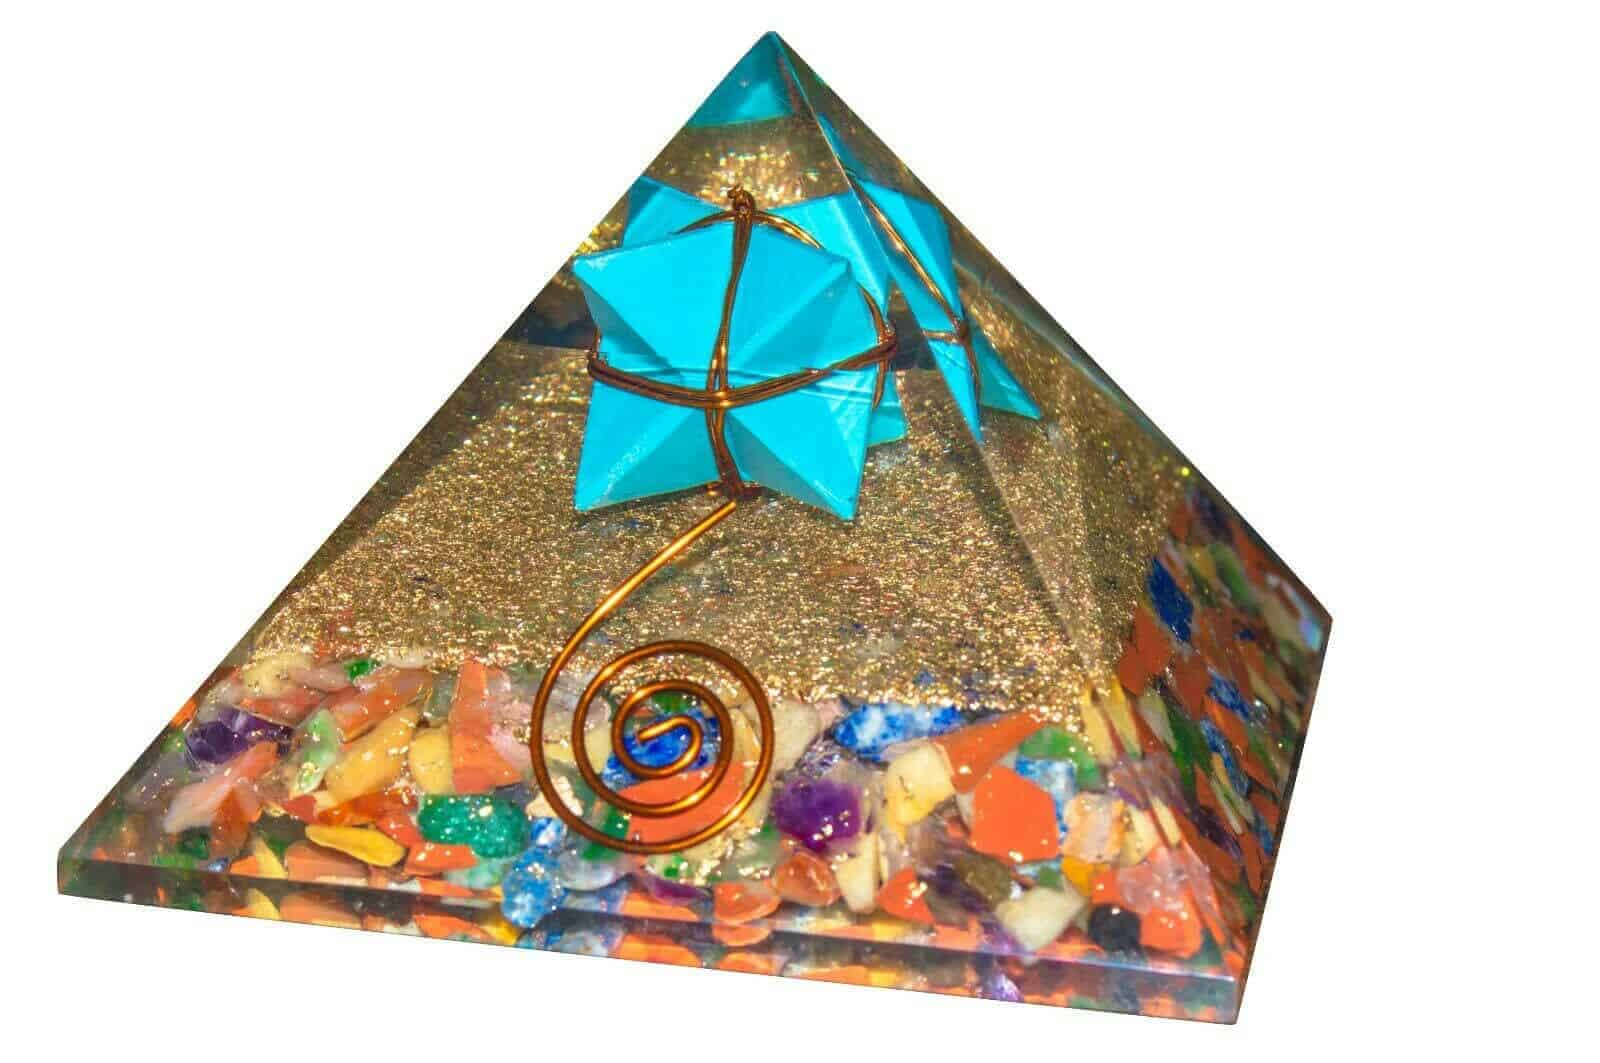 7 Chakra Orgon Pyramid med tyrkis Merkaba stjerne